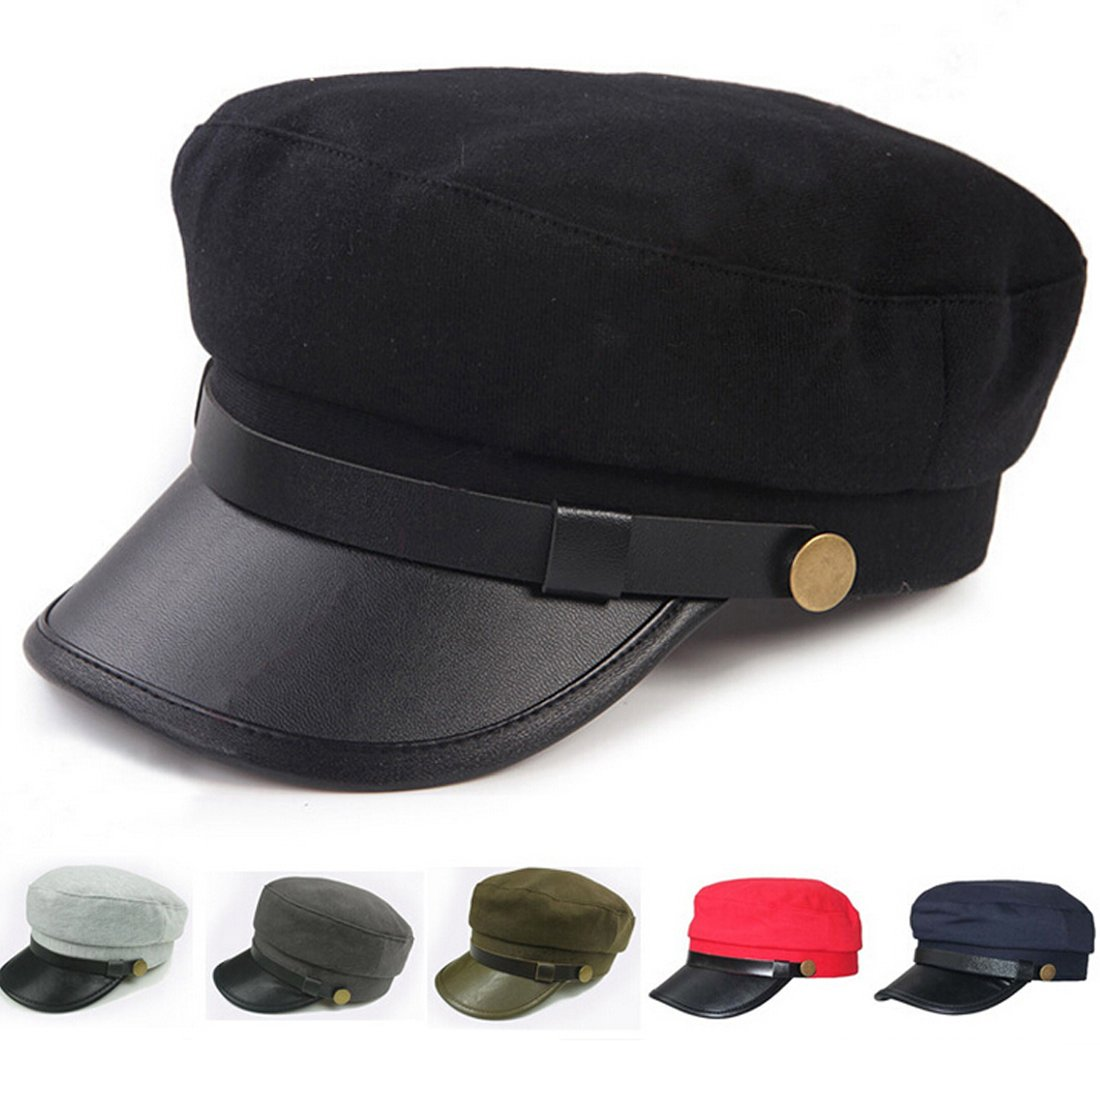 723ceaf5d8e6df Lerben Mens Women Fashion Vintage Army Cadet Military Navy Sailor Cap Flat  Top Hats Brim Visor Hat Cap Black: Amazon.co.uk: Clothing